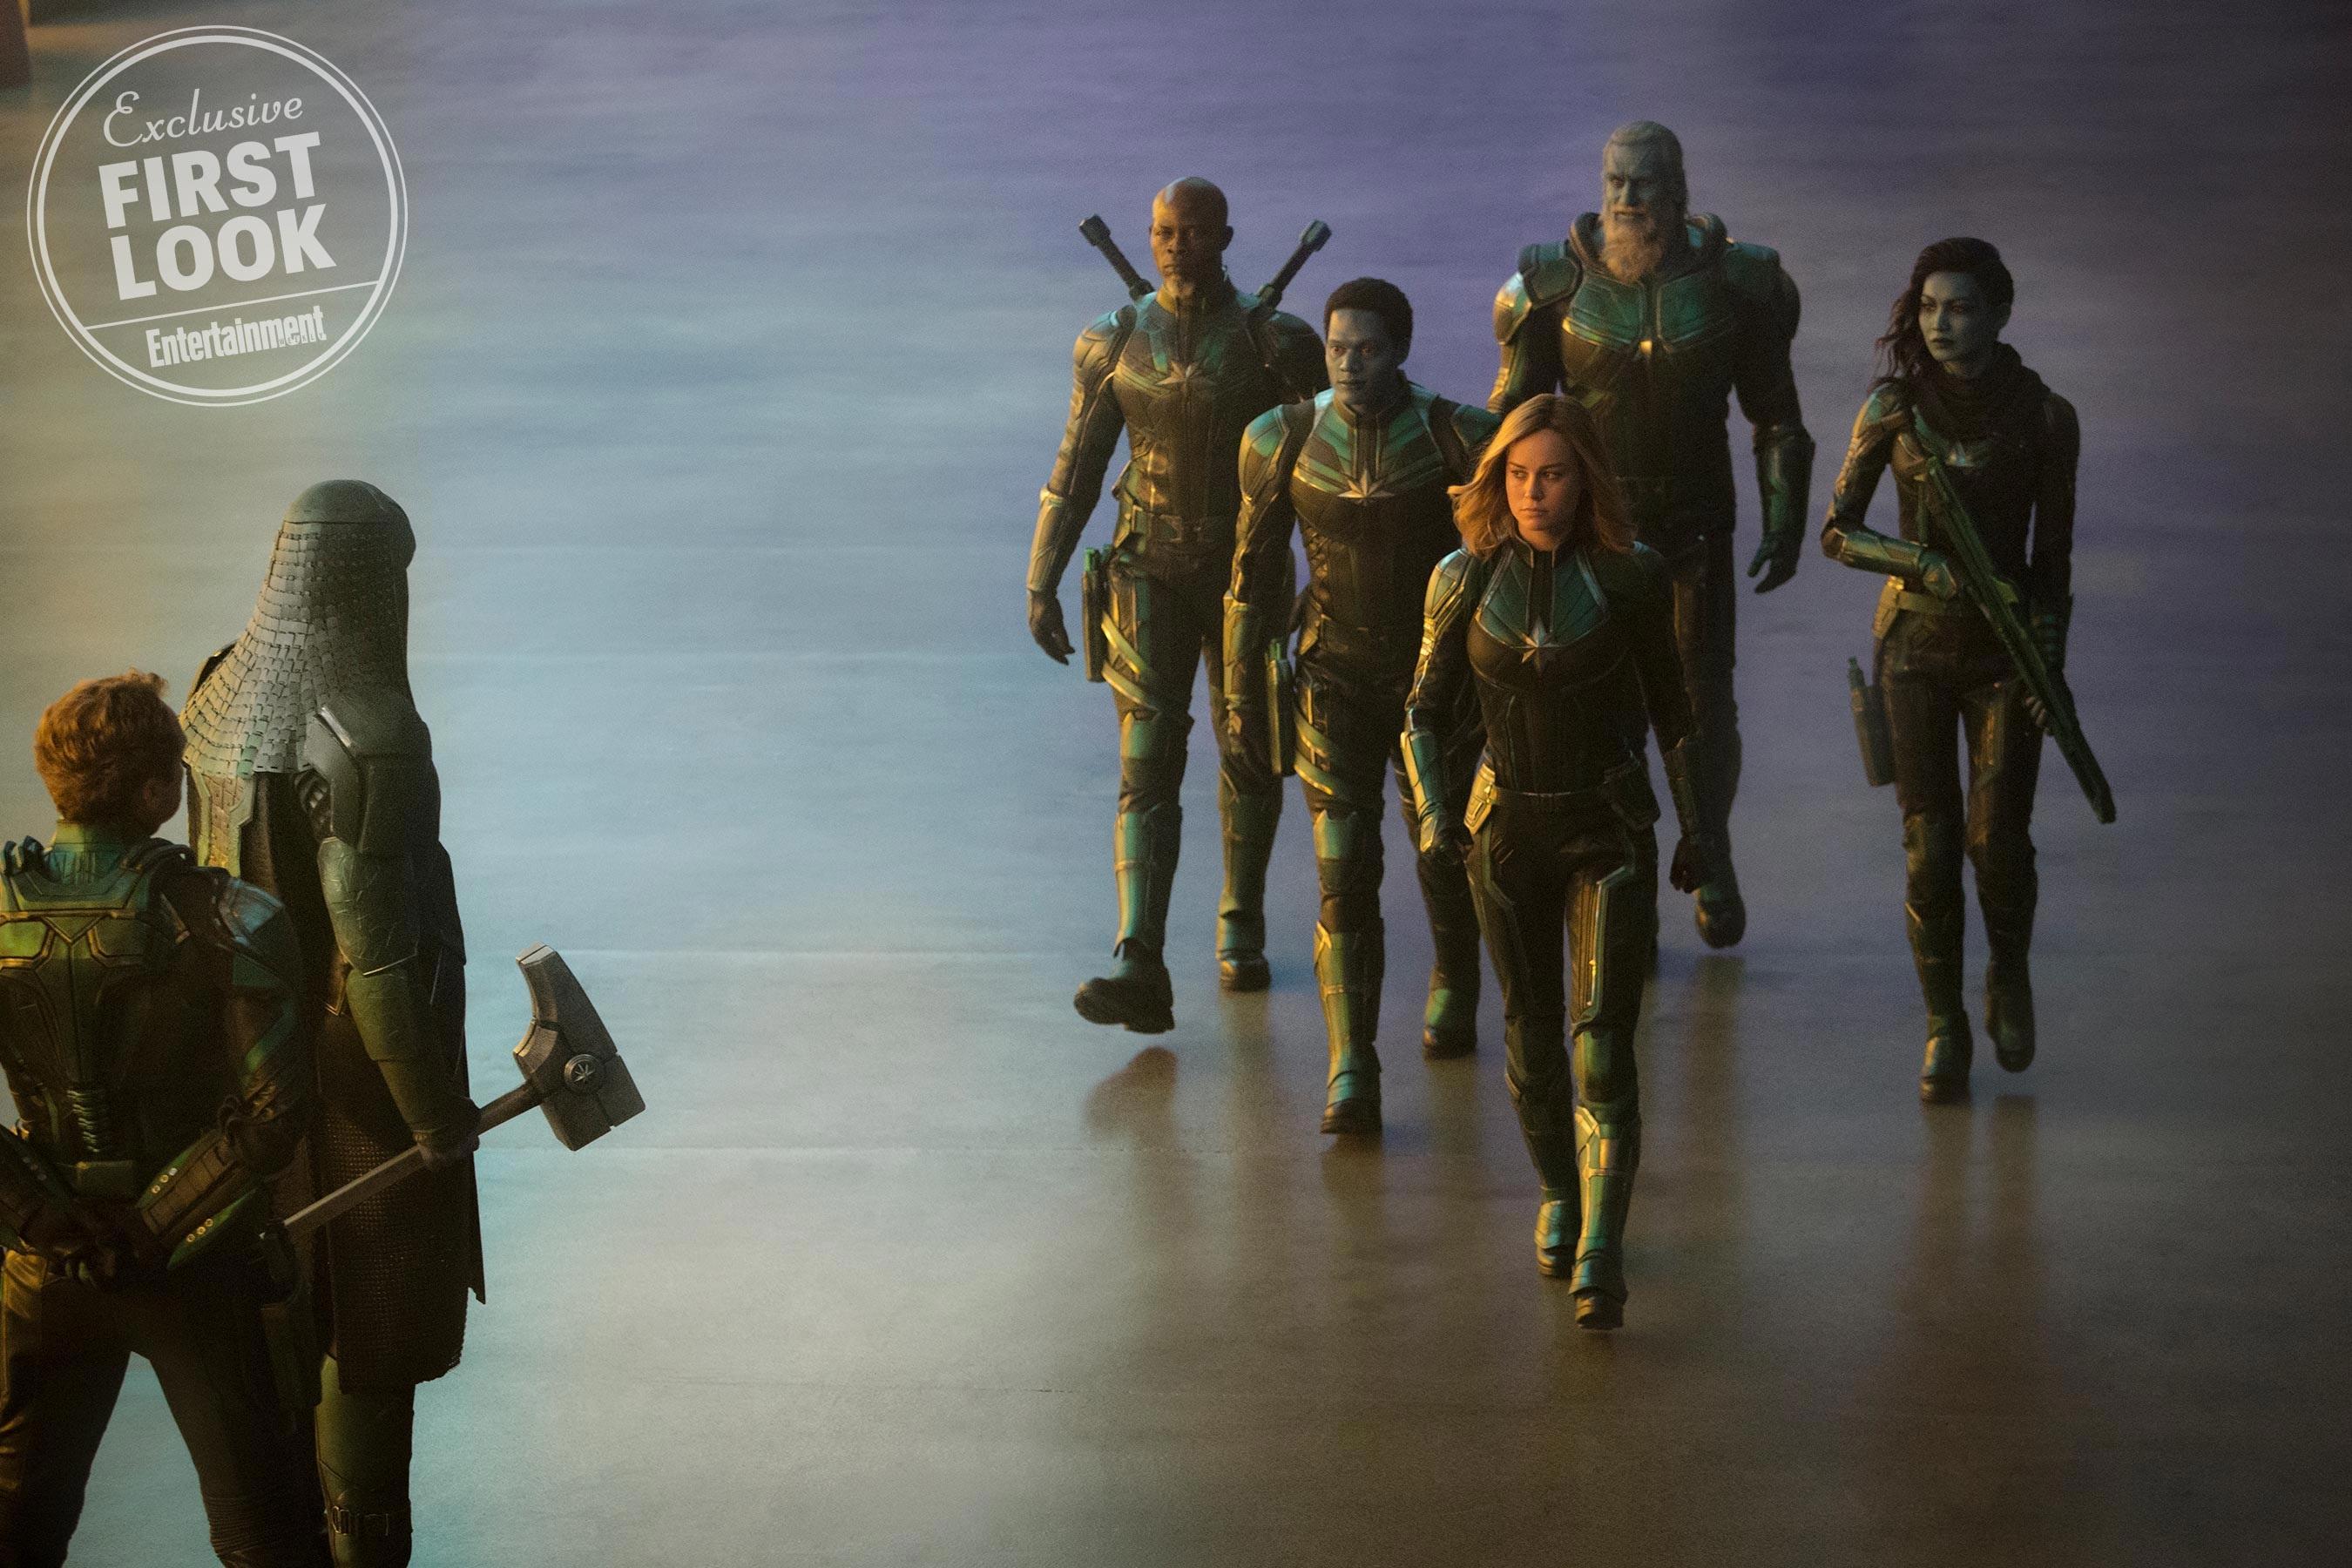 Ronan meets Mar-Vell's Starforce team that includes Carol Danvers, Korath the Pursuer and Minn-Erva